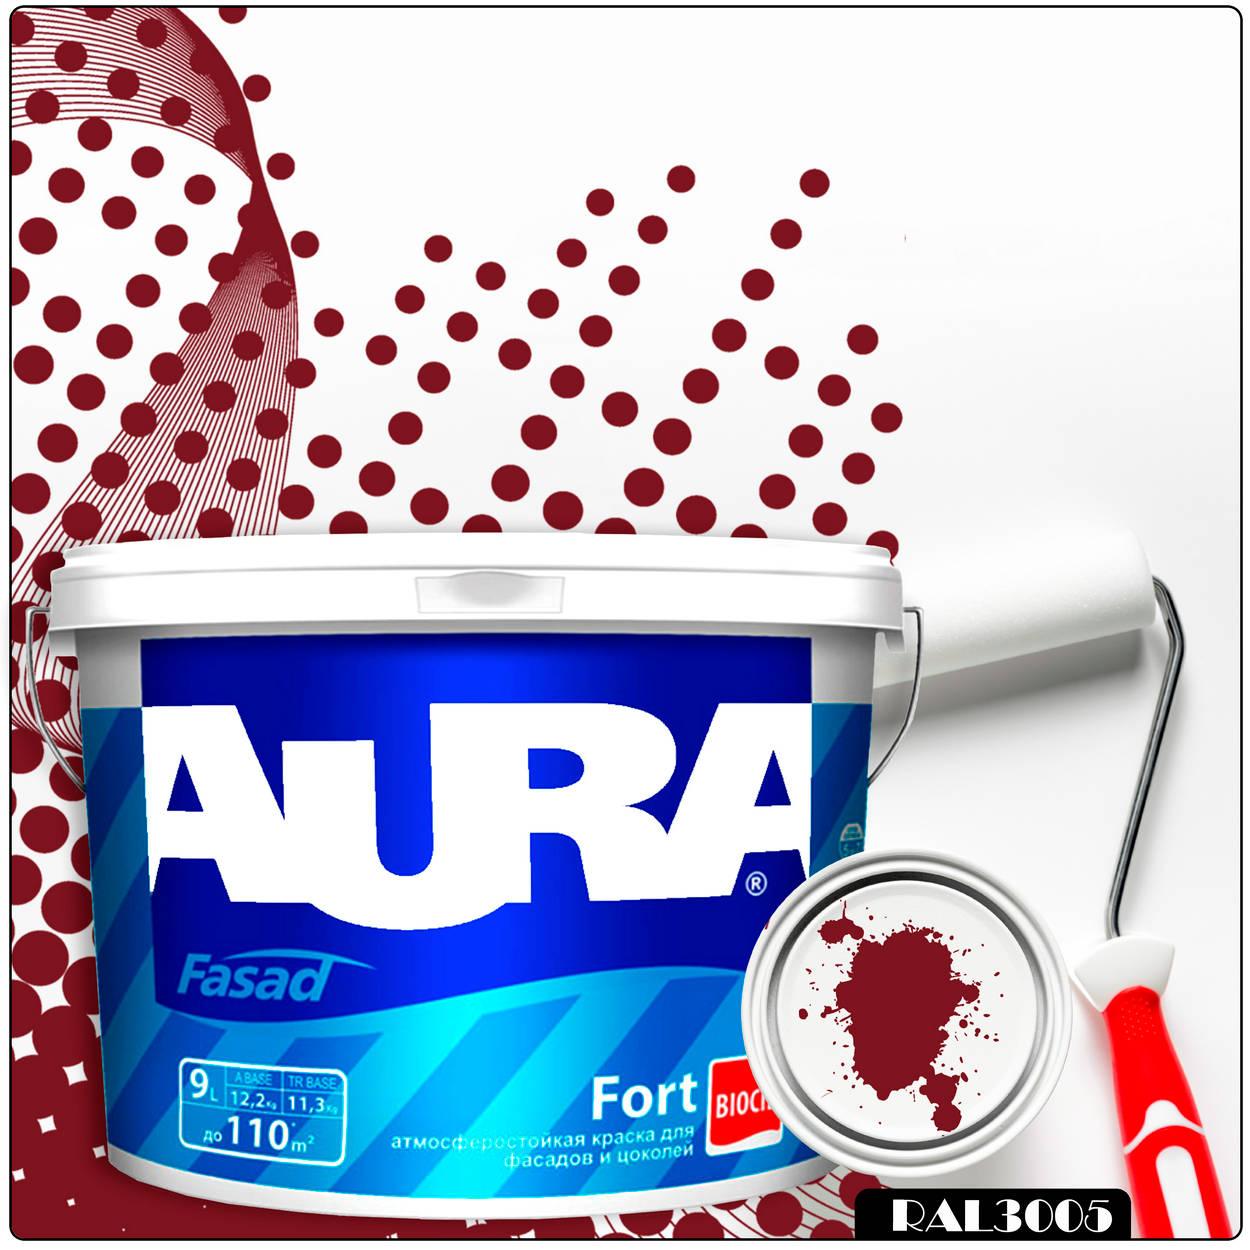 Фото 6 - Краска Aura Fasad Fort, RAL 3005 Вишневый, латексная, матовая, для фасада и цоколей, 9л, Аура.